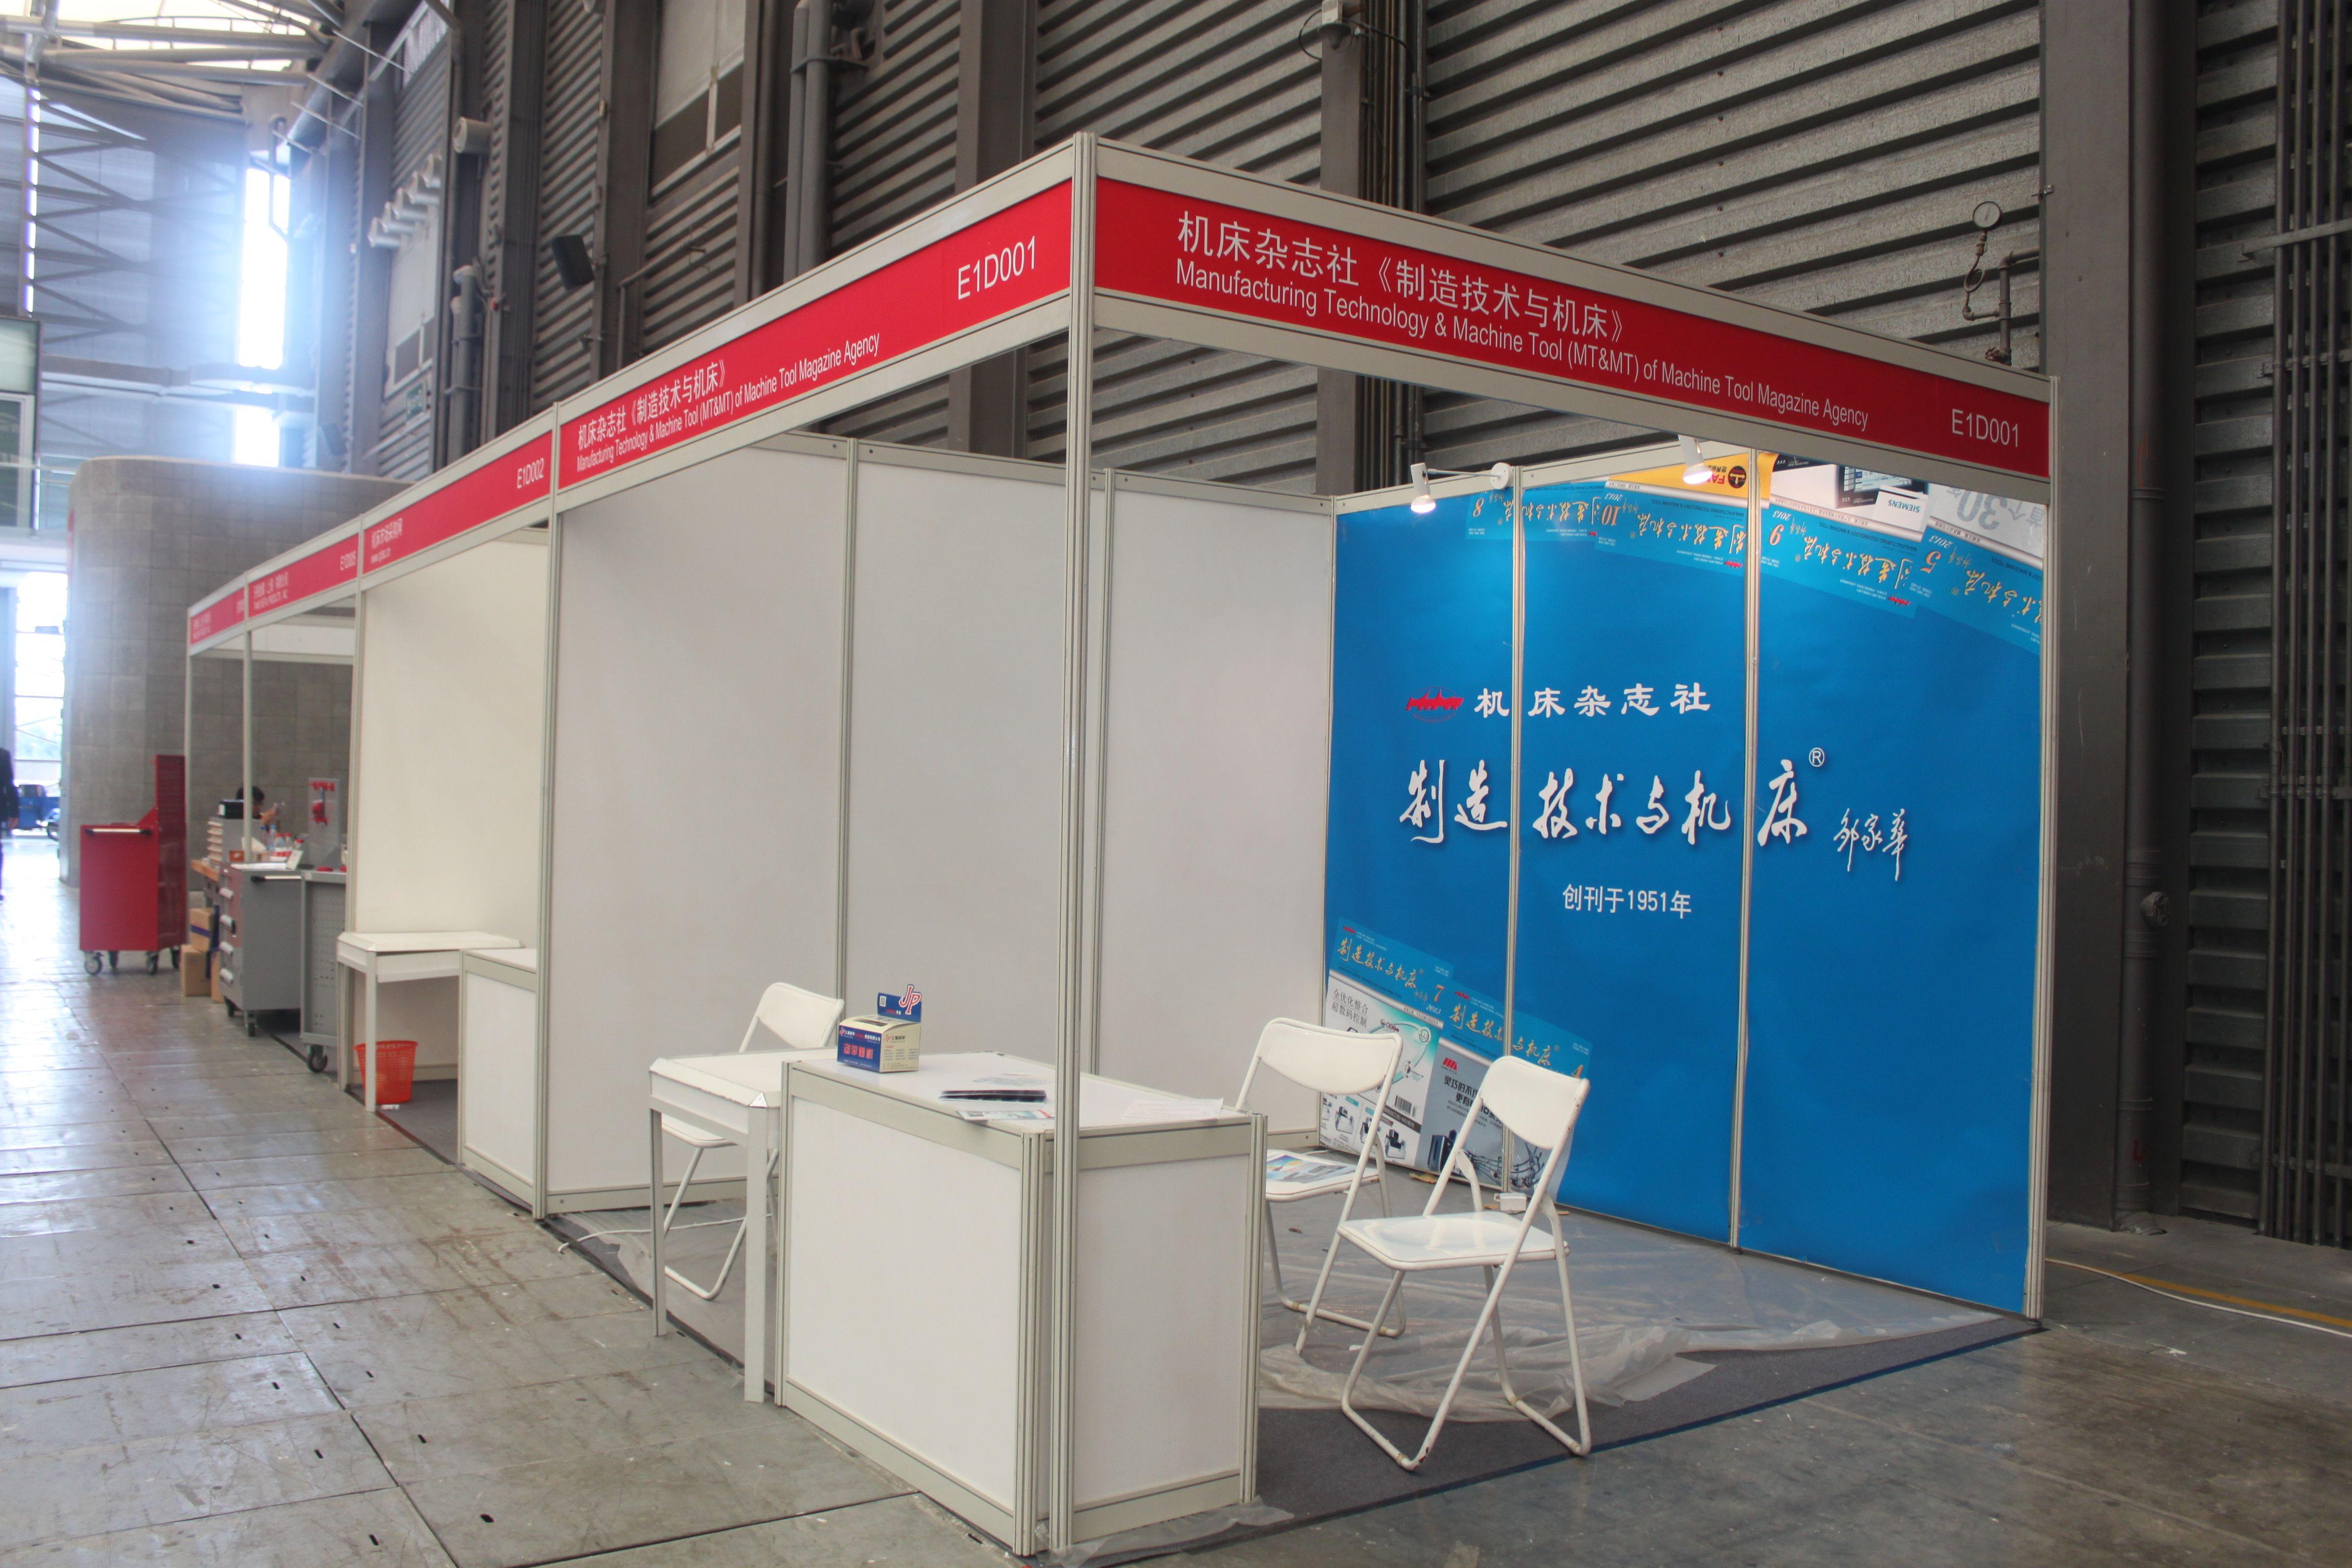 Exhibition Booth Standard Shell Scheme : Trade show 3x3 modular standard shell scheme booth from china